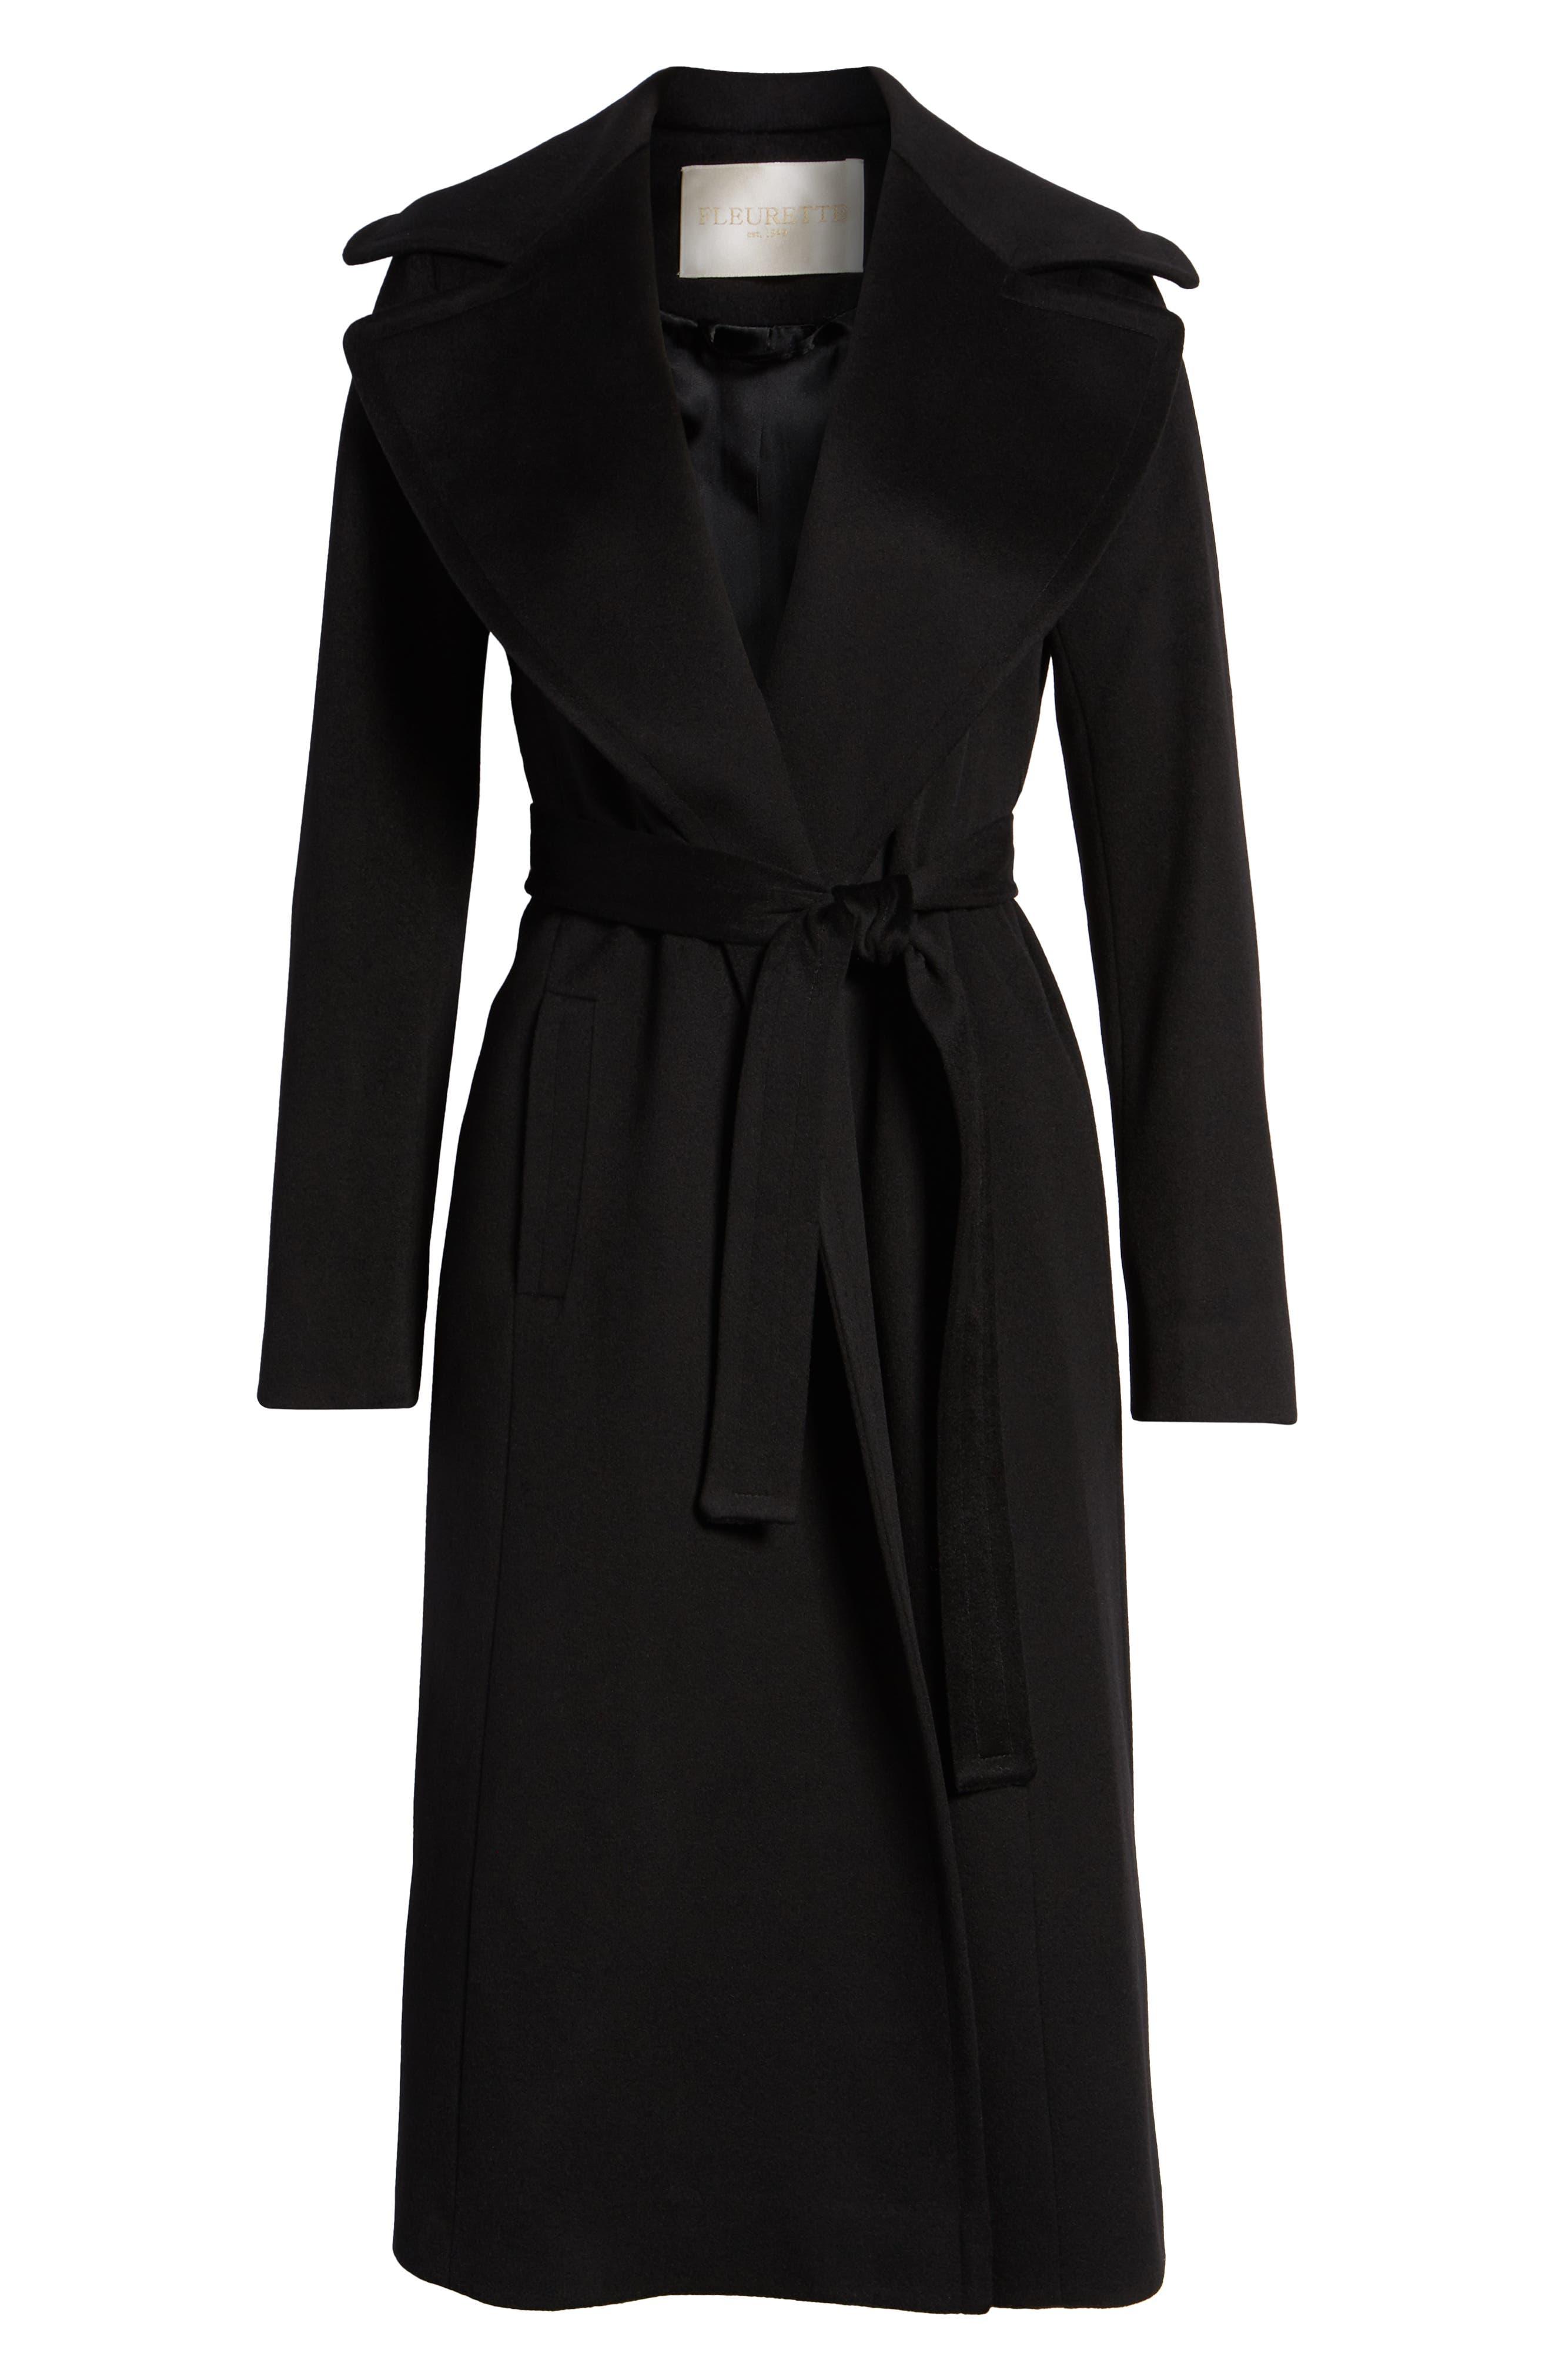 FLEURETTE, Loro Piana Wool Wrap Coat, Alternate thumbnail 6, color, 001